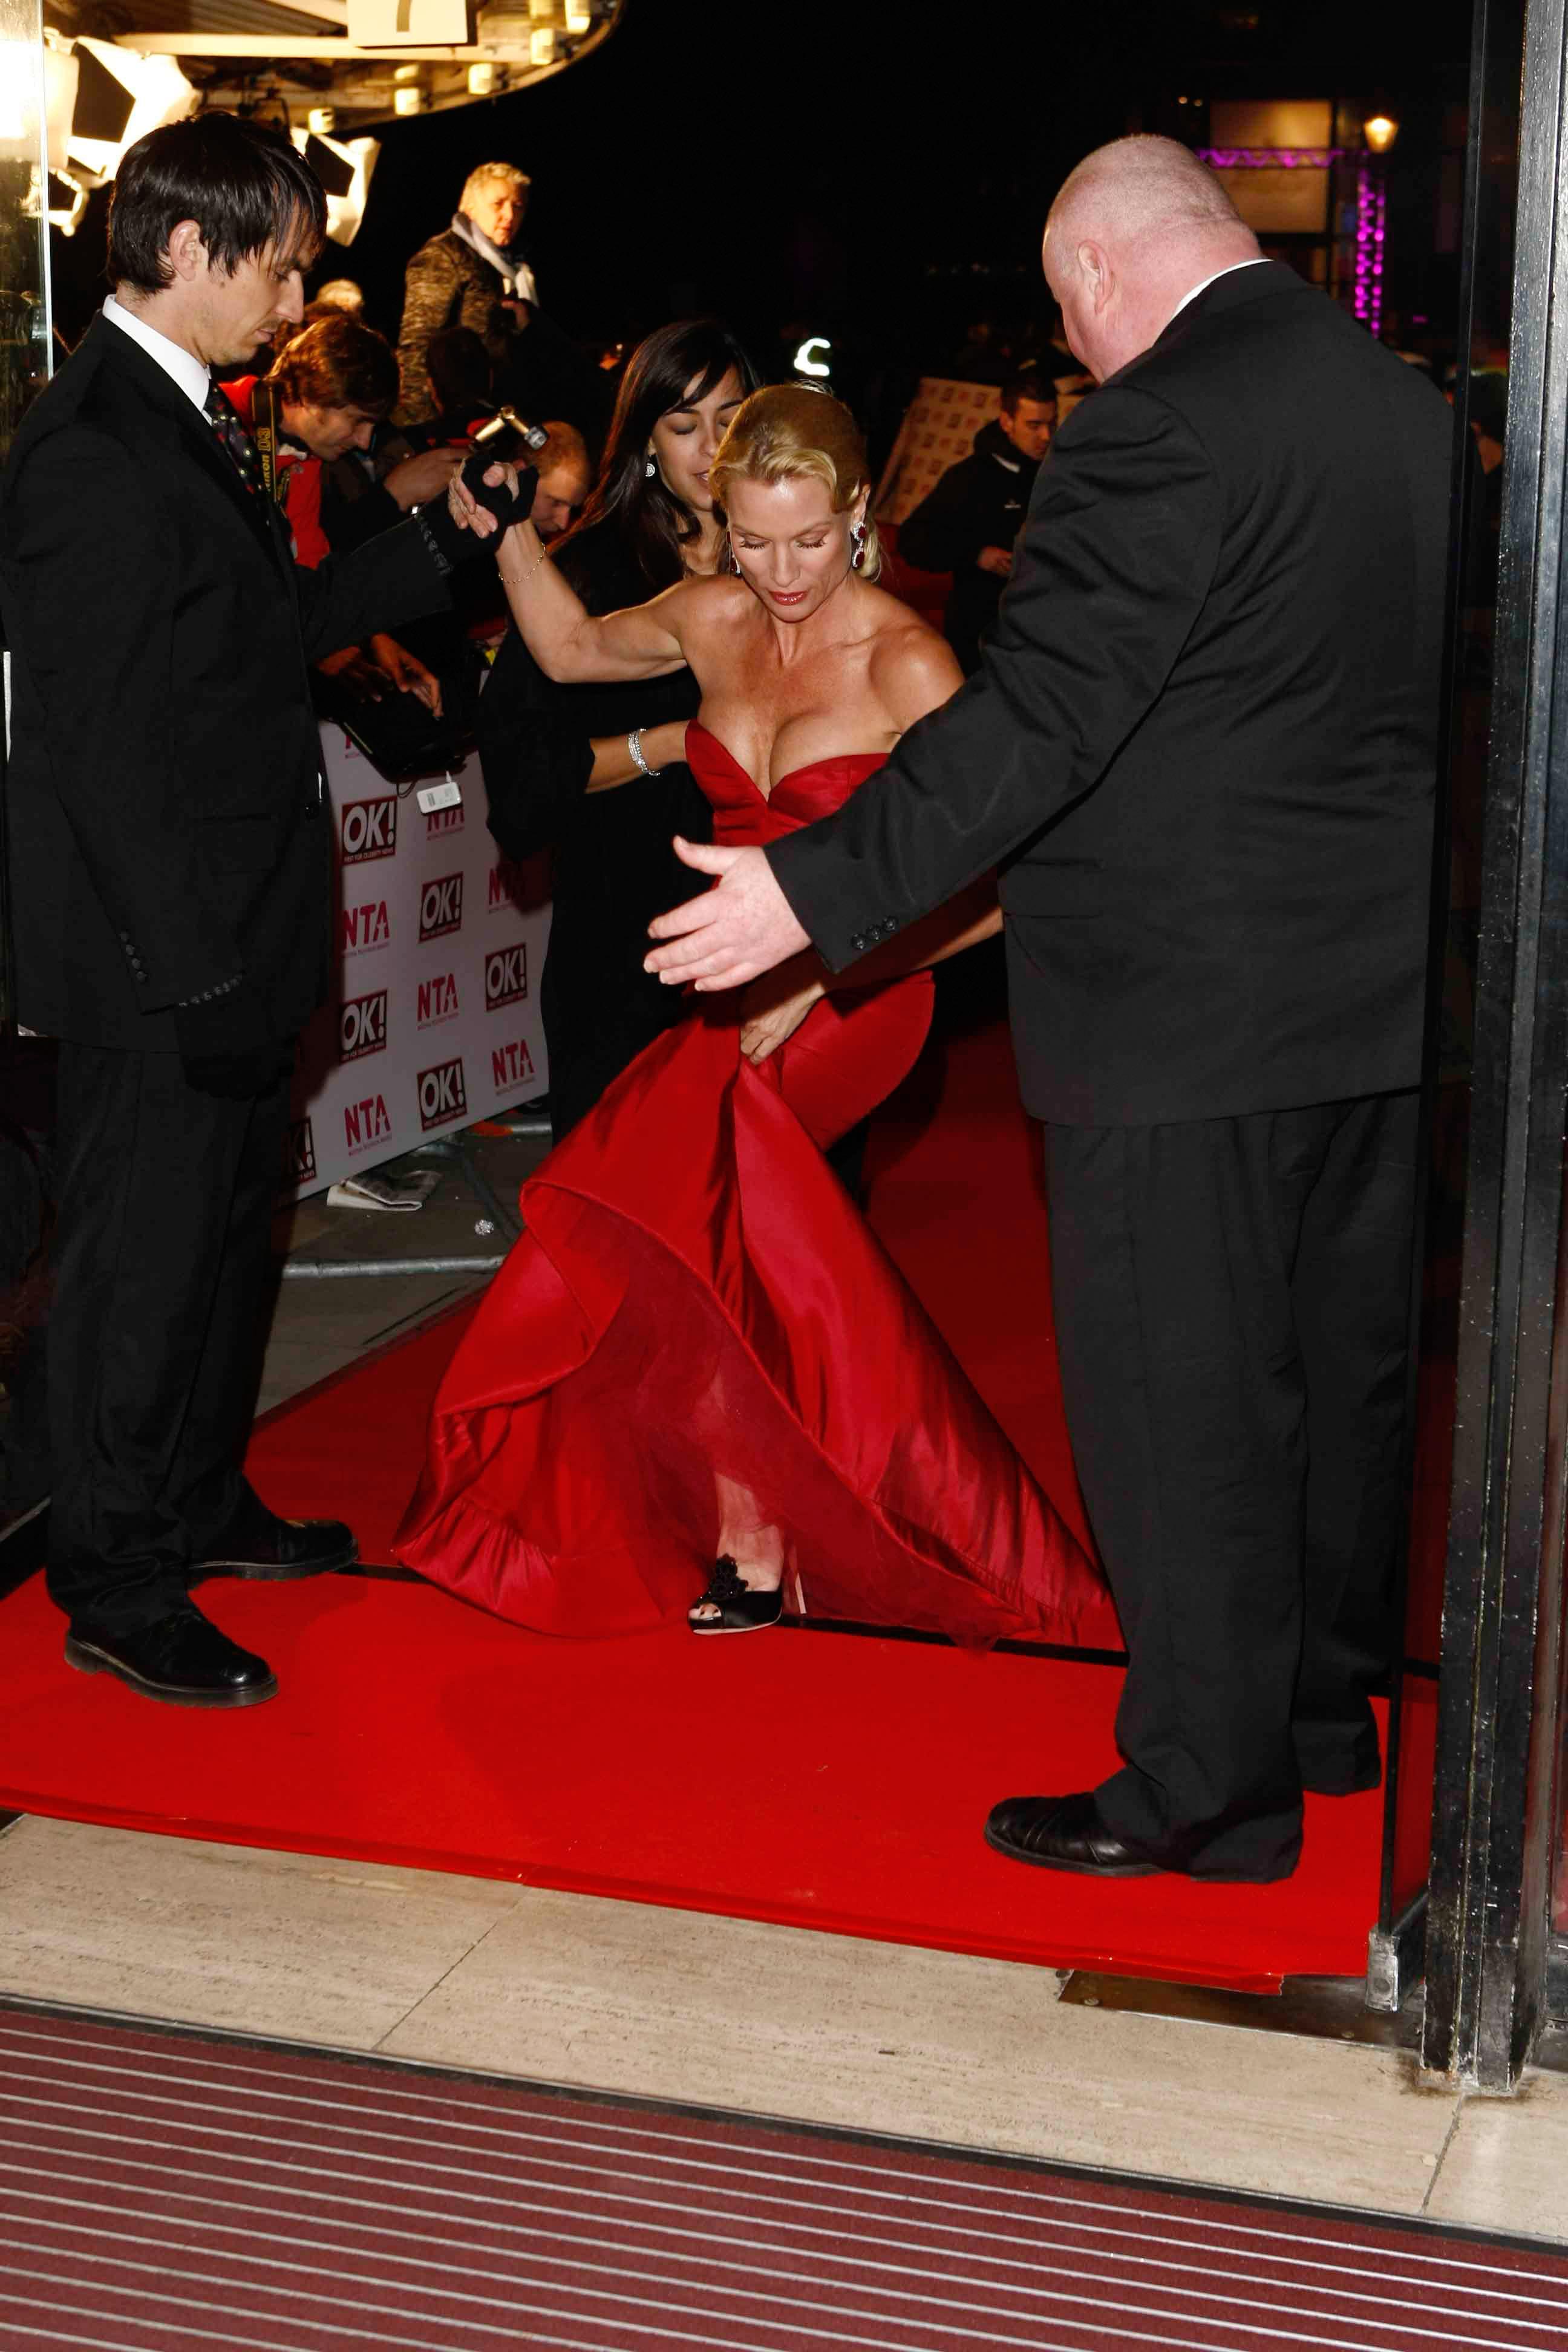 15490_Celebutopia-Nicollette_Sheridan-2008_National_Television_Awards-10_122_398lo.jpg